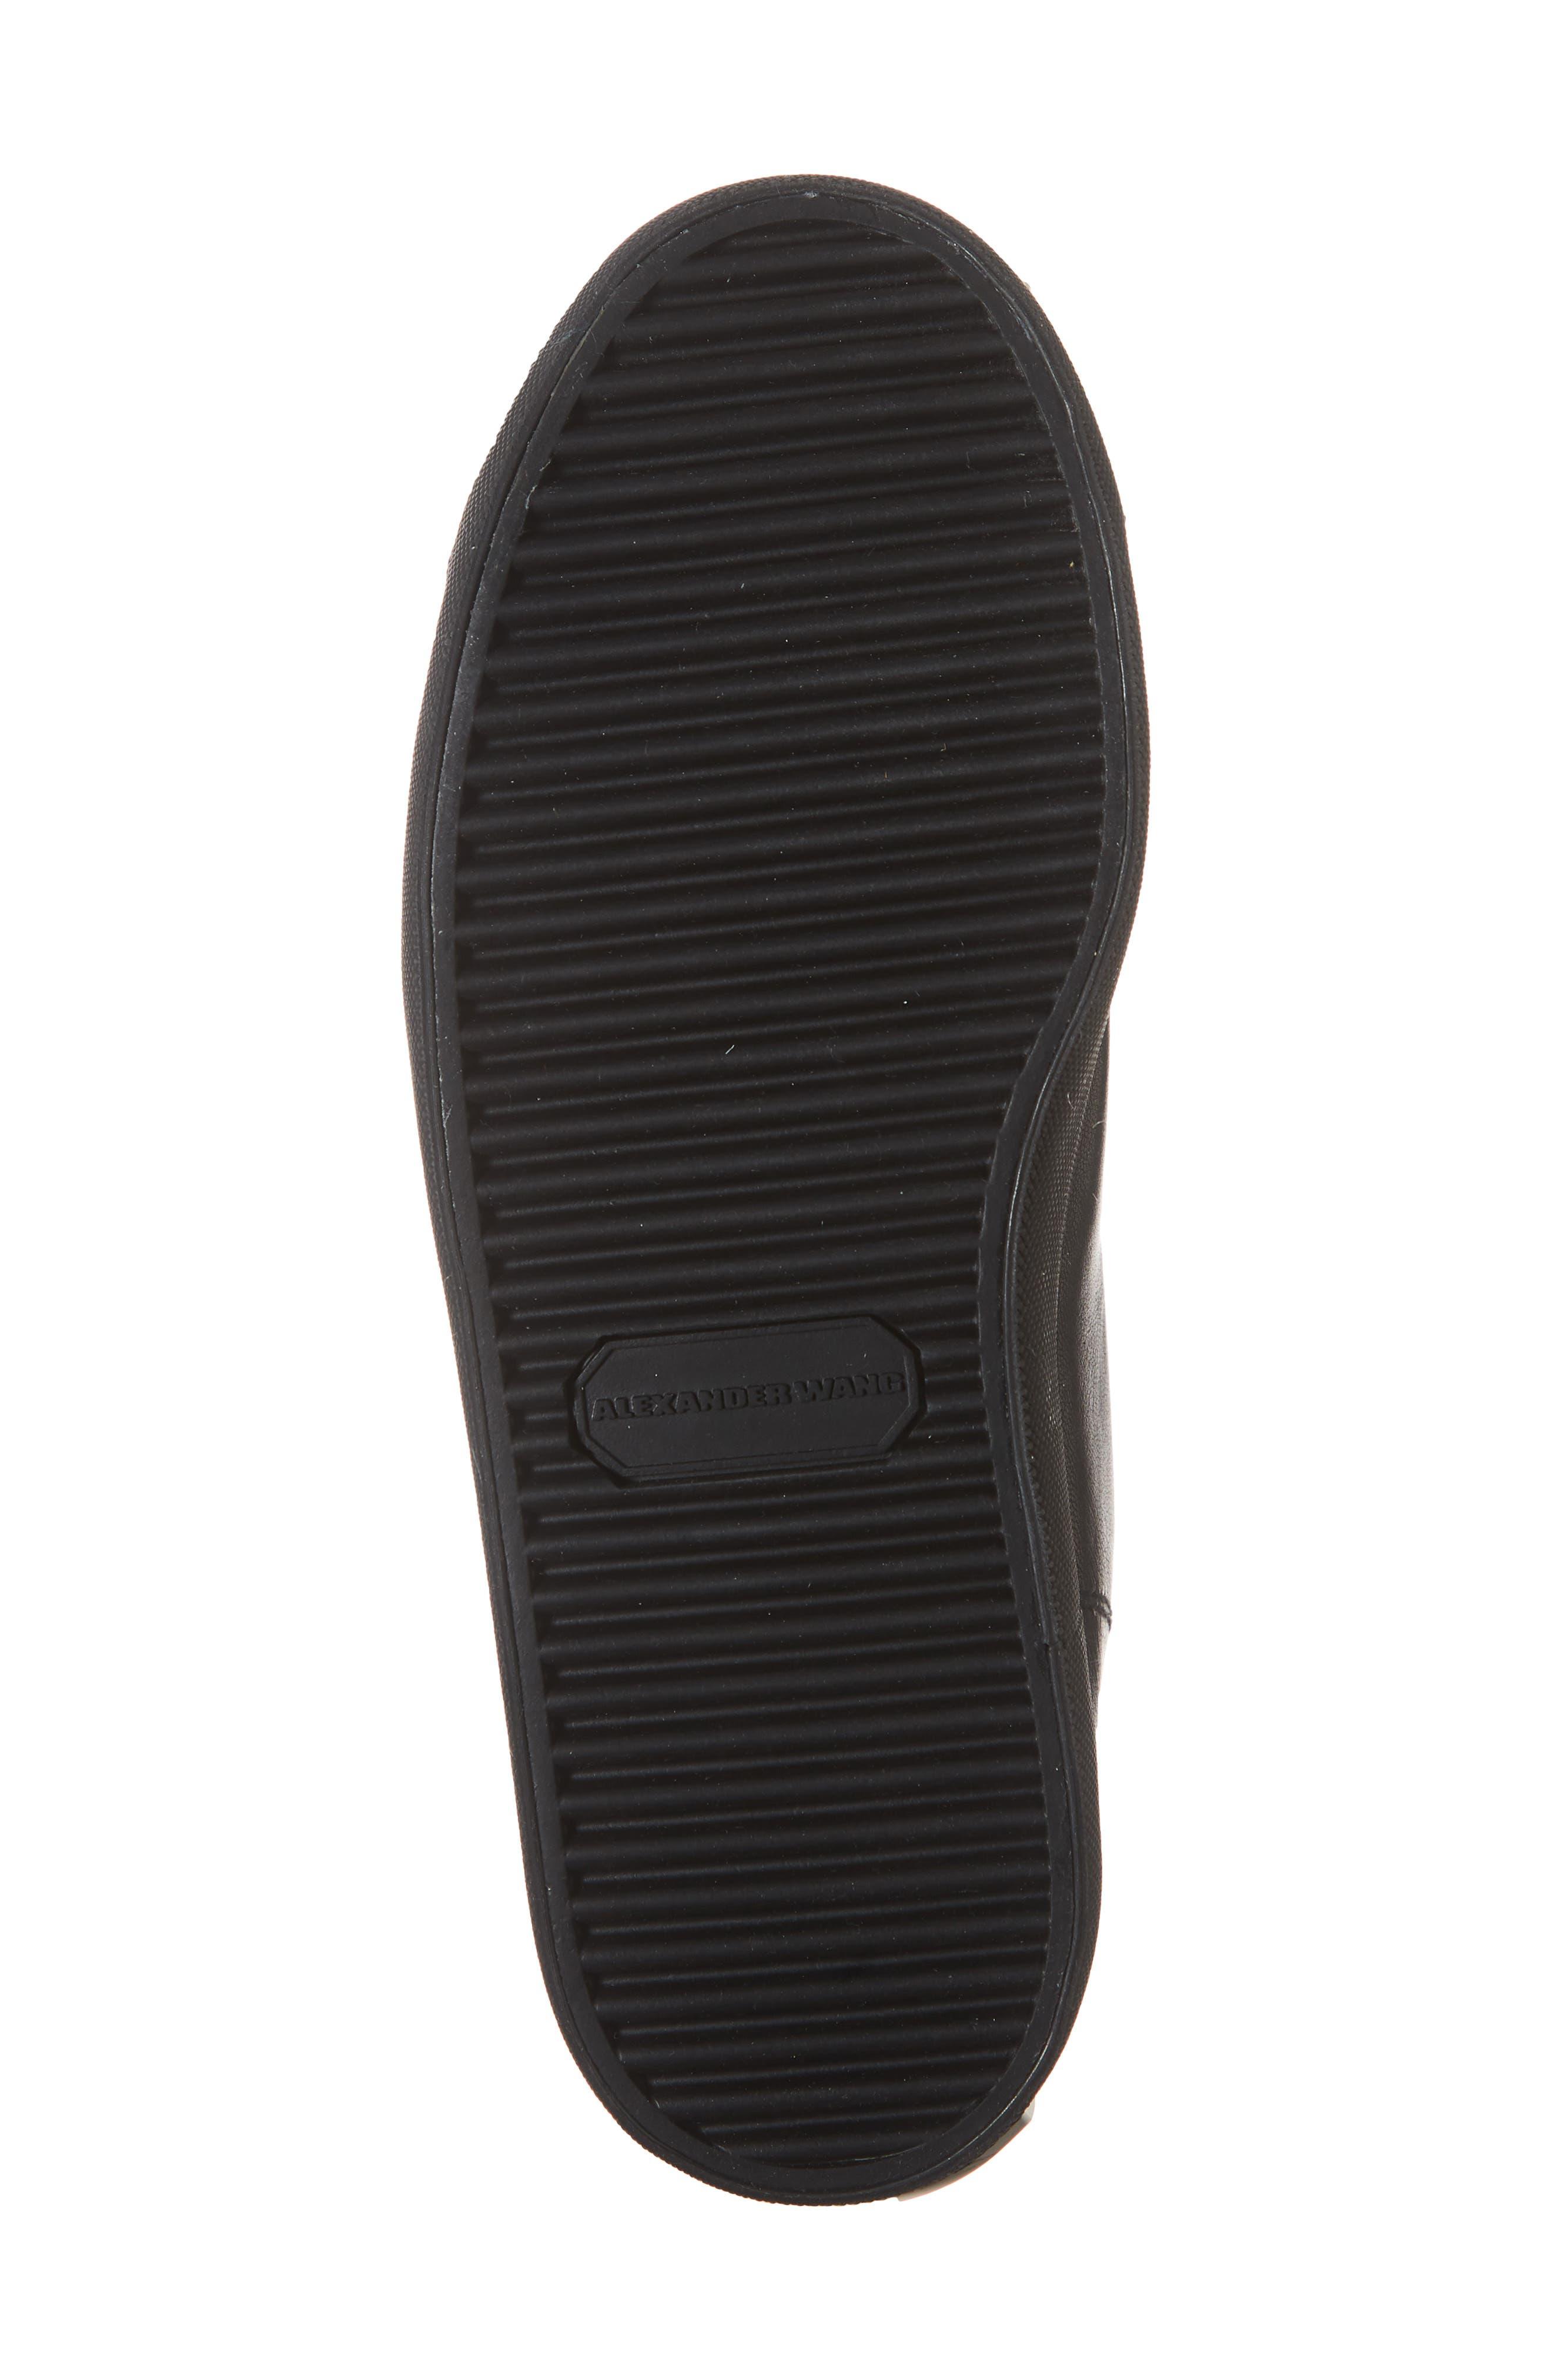 ALEXANDER WANG, Pia High Top Sneaker, Alternate thumbnail 6, color, BLACK